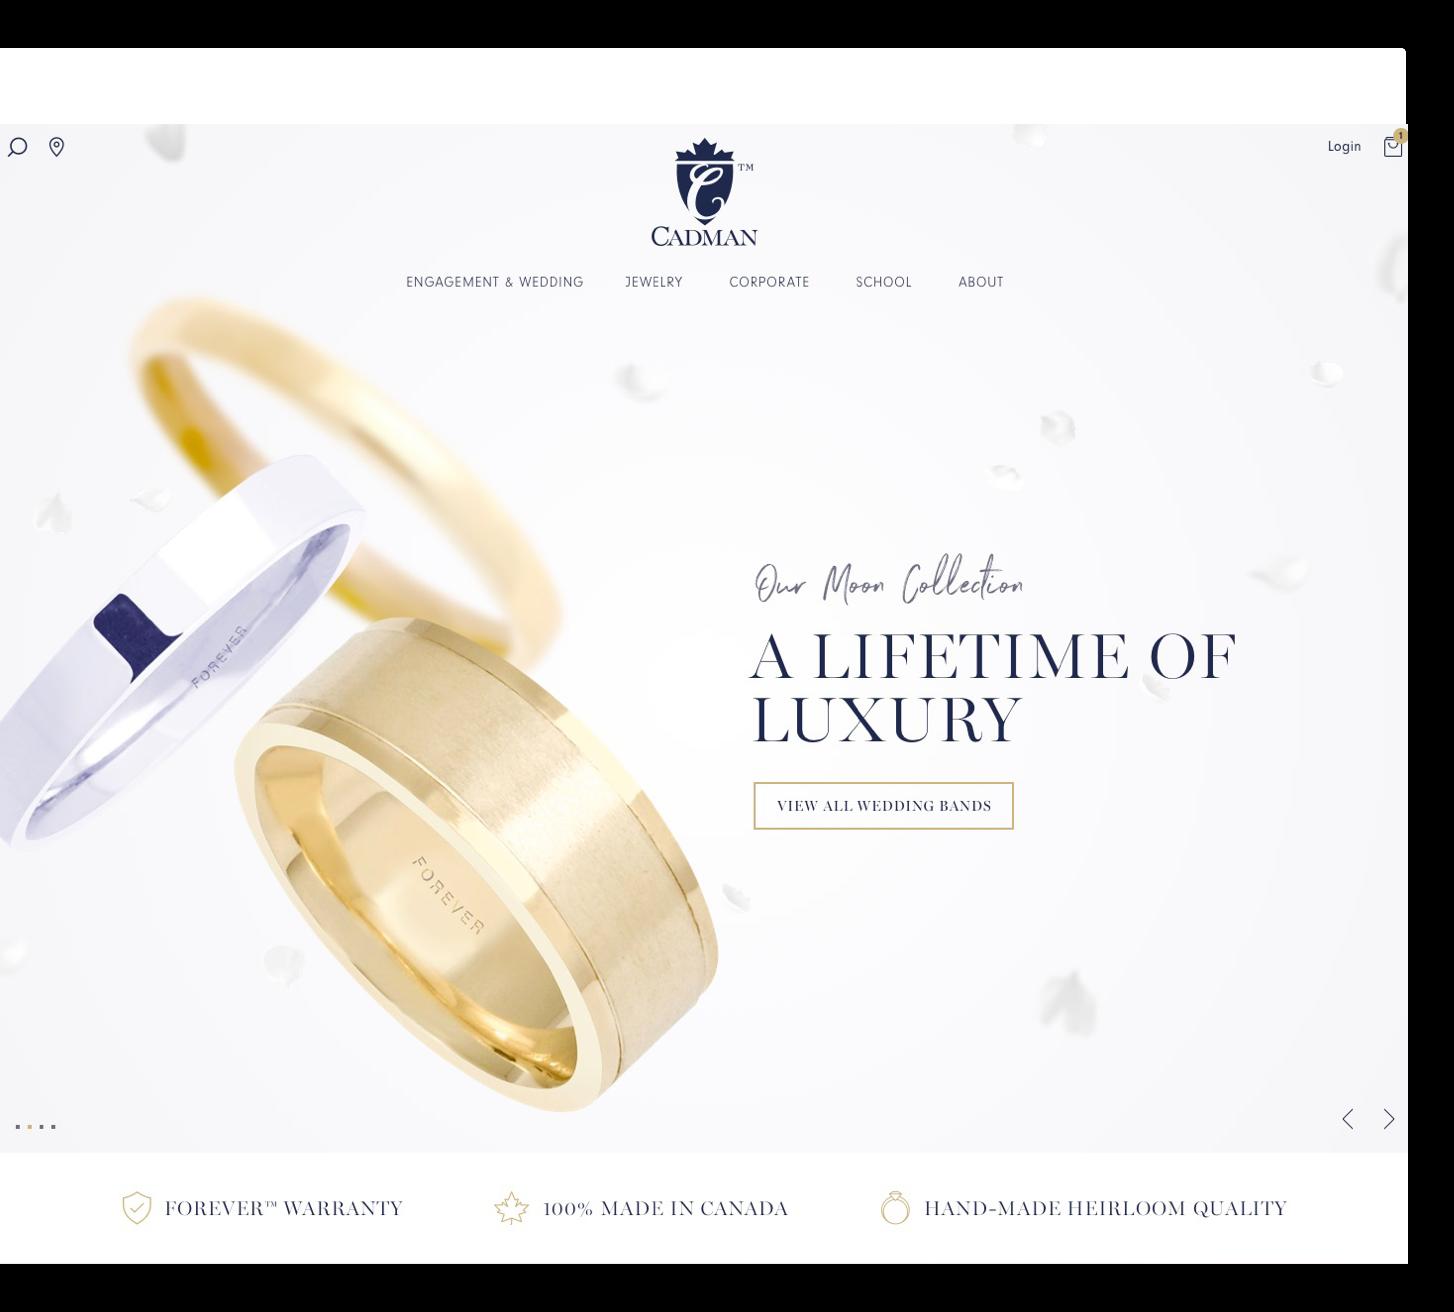 Cadman's luxury jewelry website layout